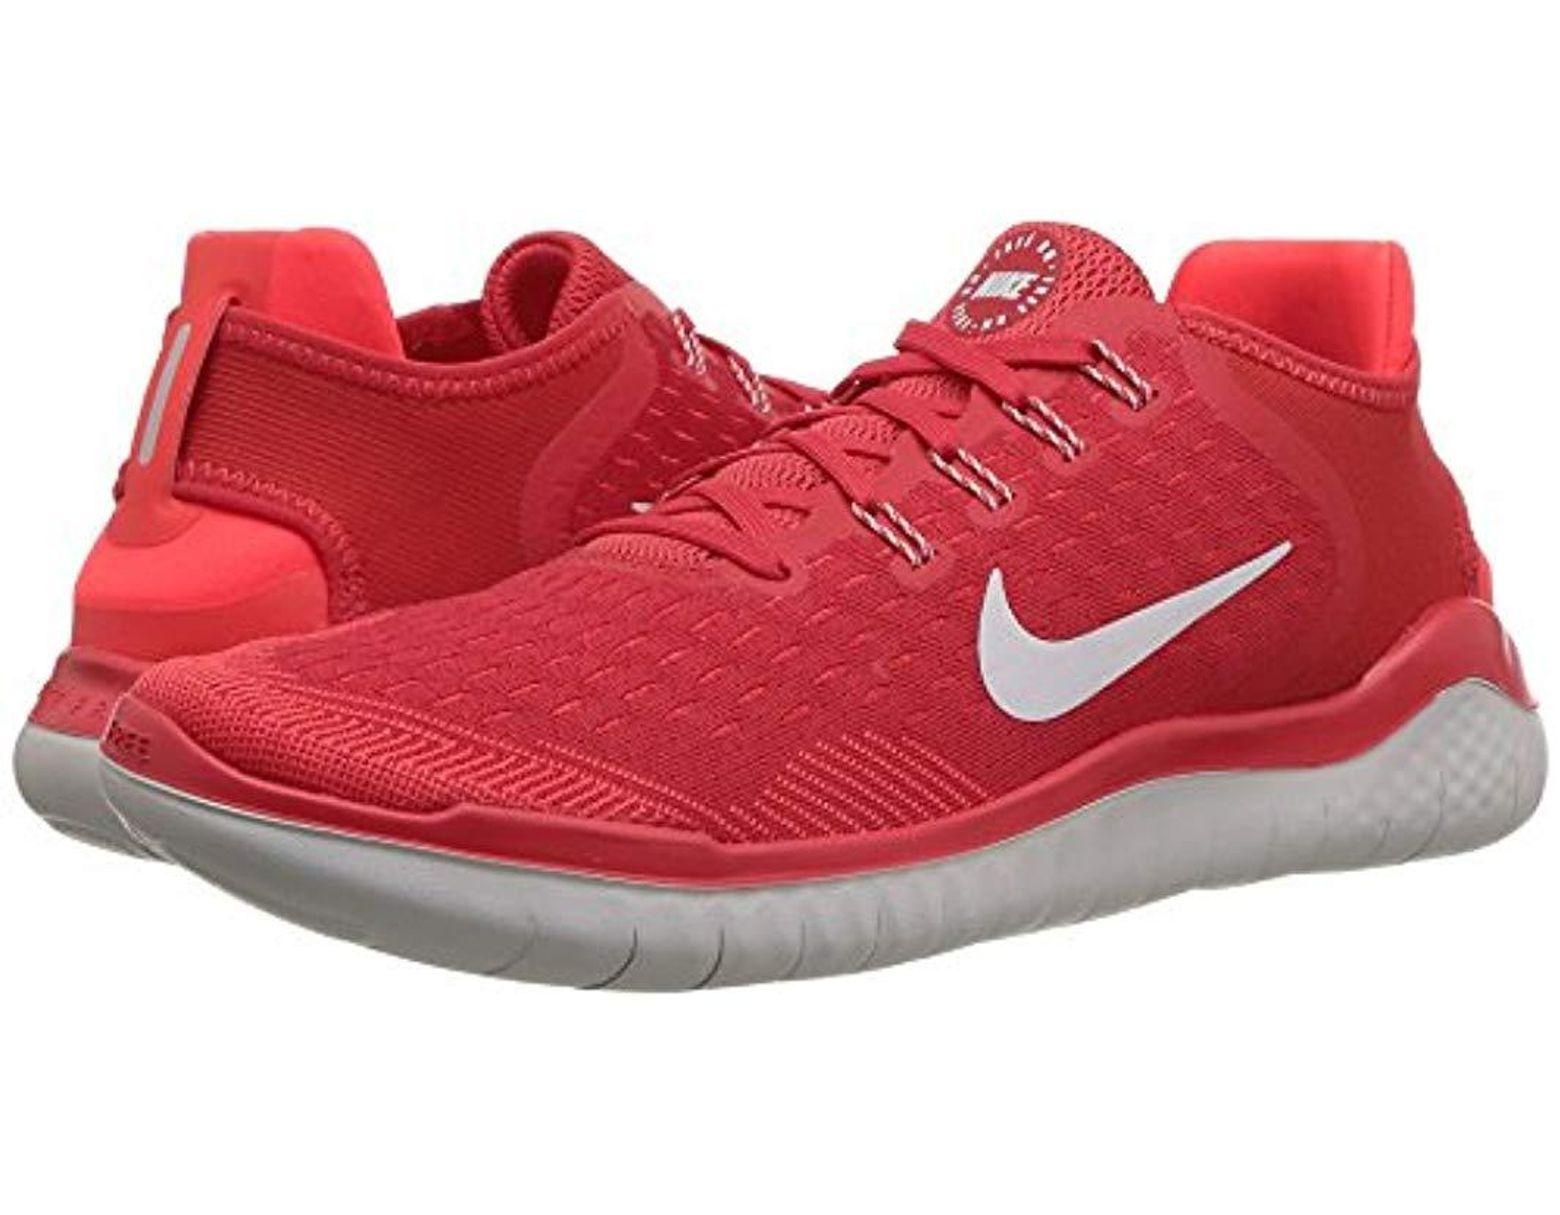 Nike Damen W Flex Trainer 8 Sneaker, Grau (Vast GreyWhite